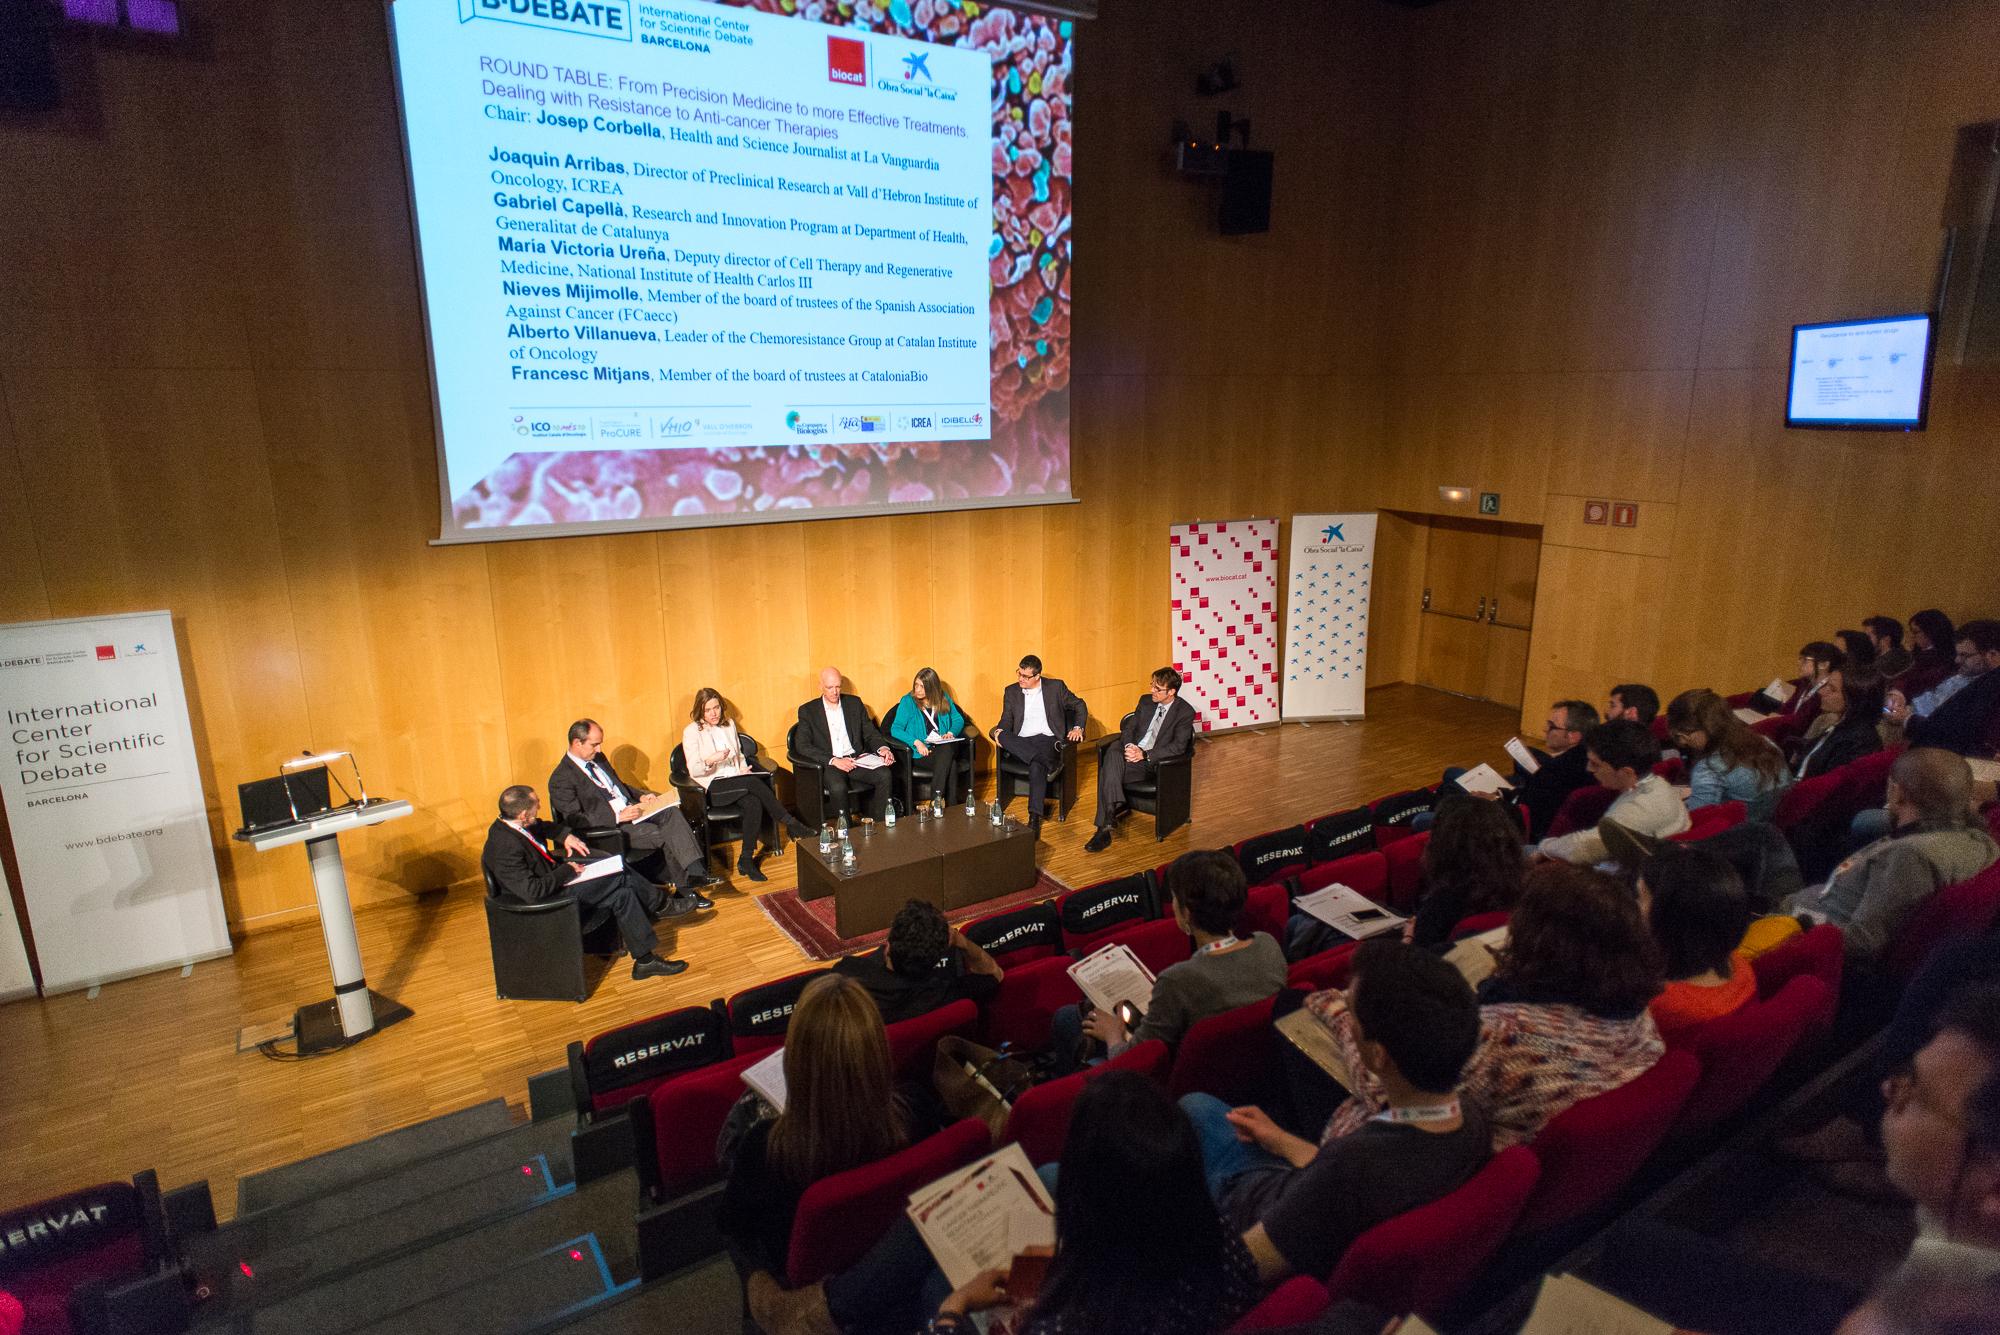 Mesa redonda - B·Debate Cancer Therapeutic Resistance